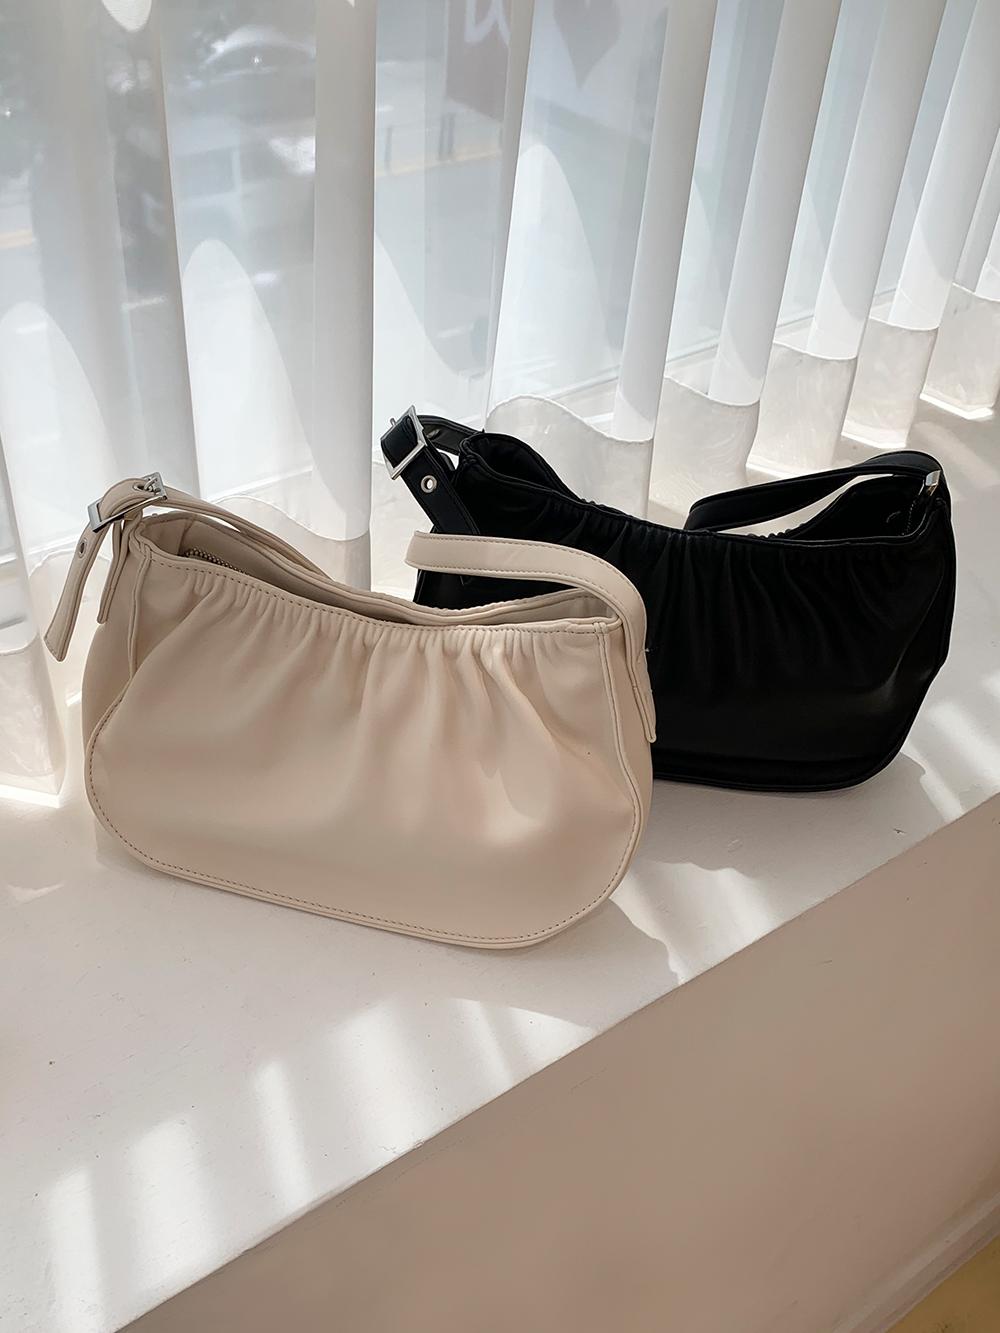 wrinkle bag